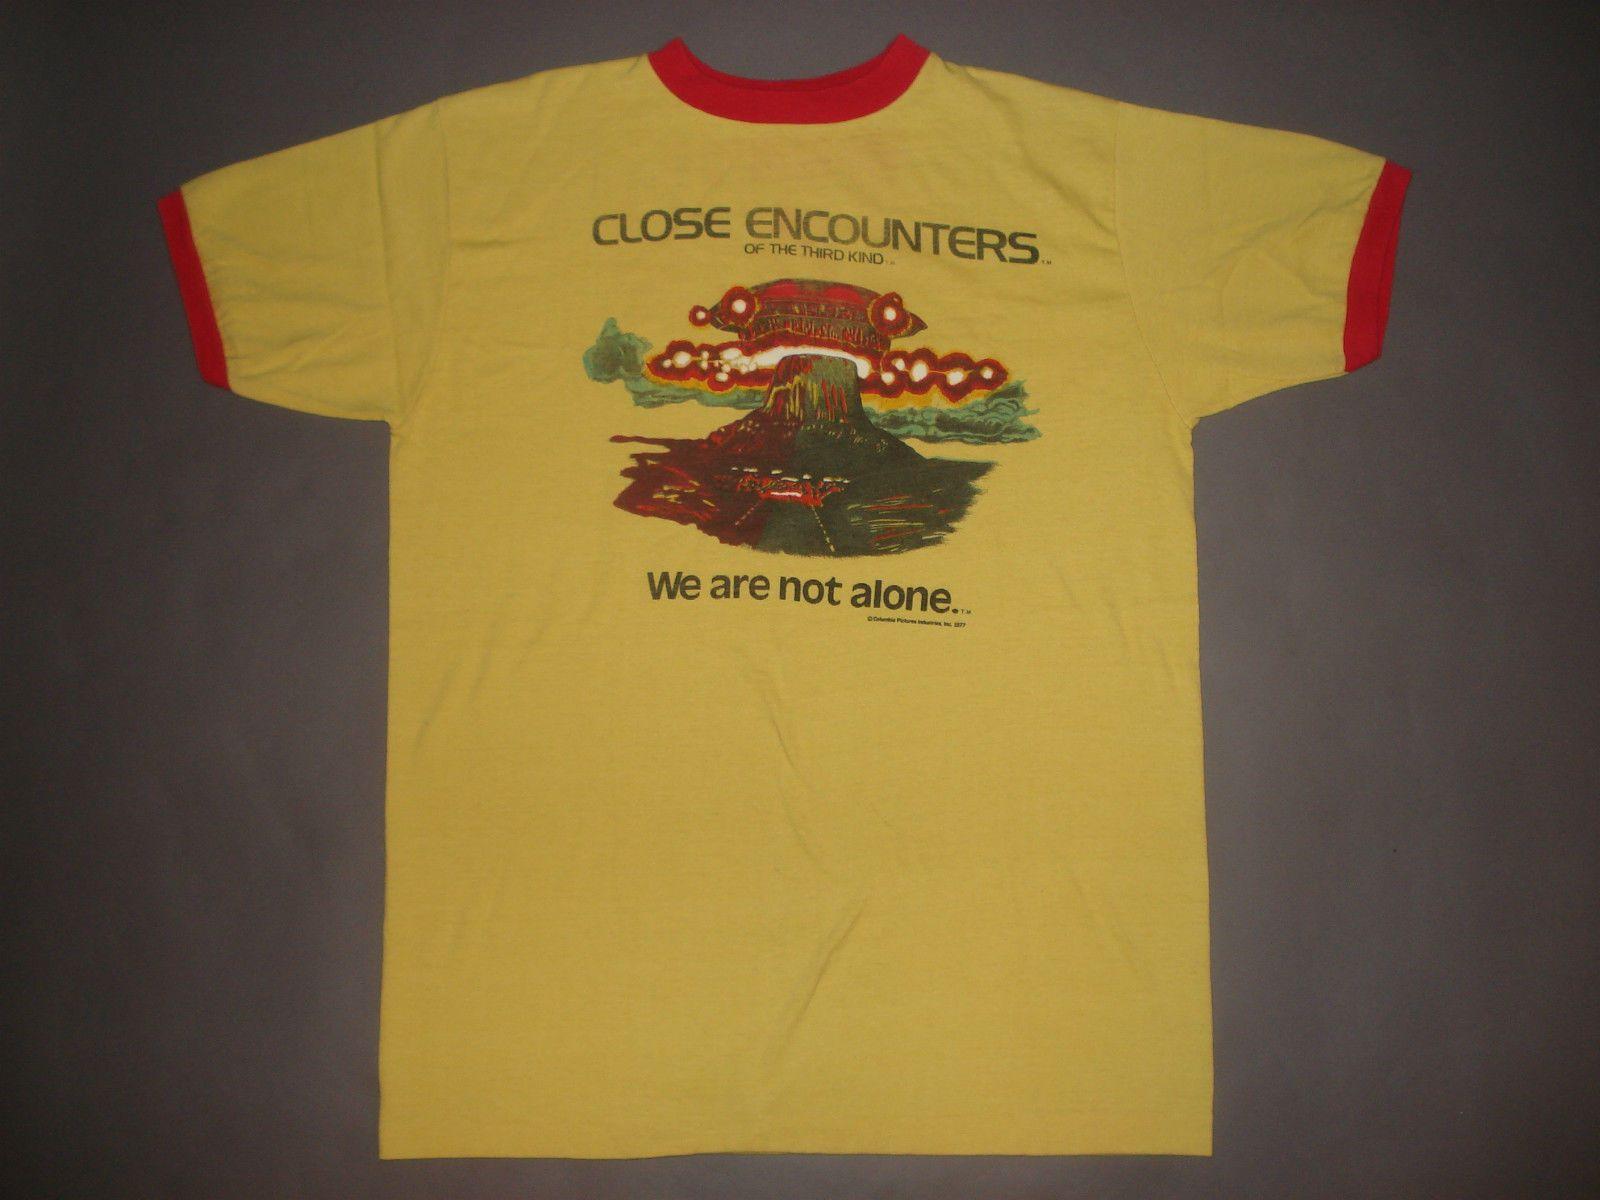 799a13c38e04 Pin by Jonathan Lupo on Memories | Mens tops, Close encounters, Shirts